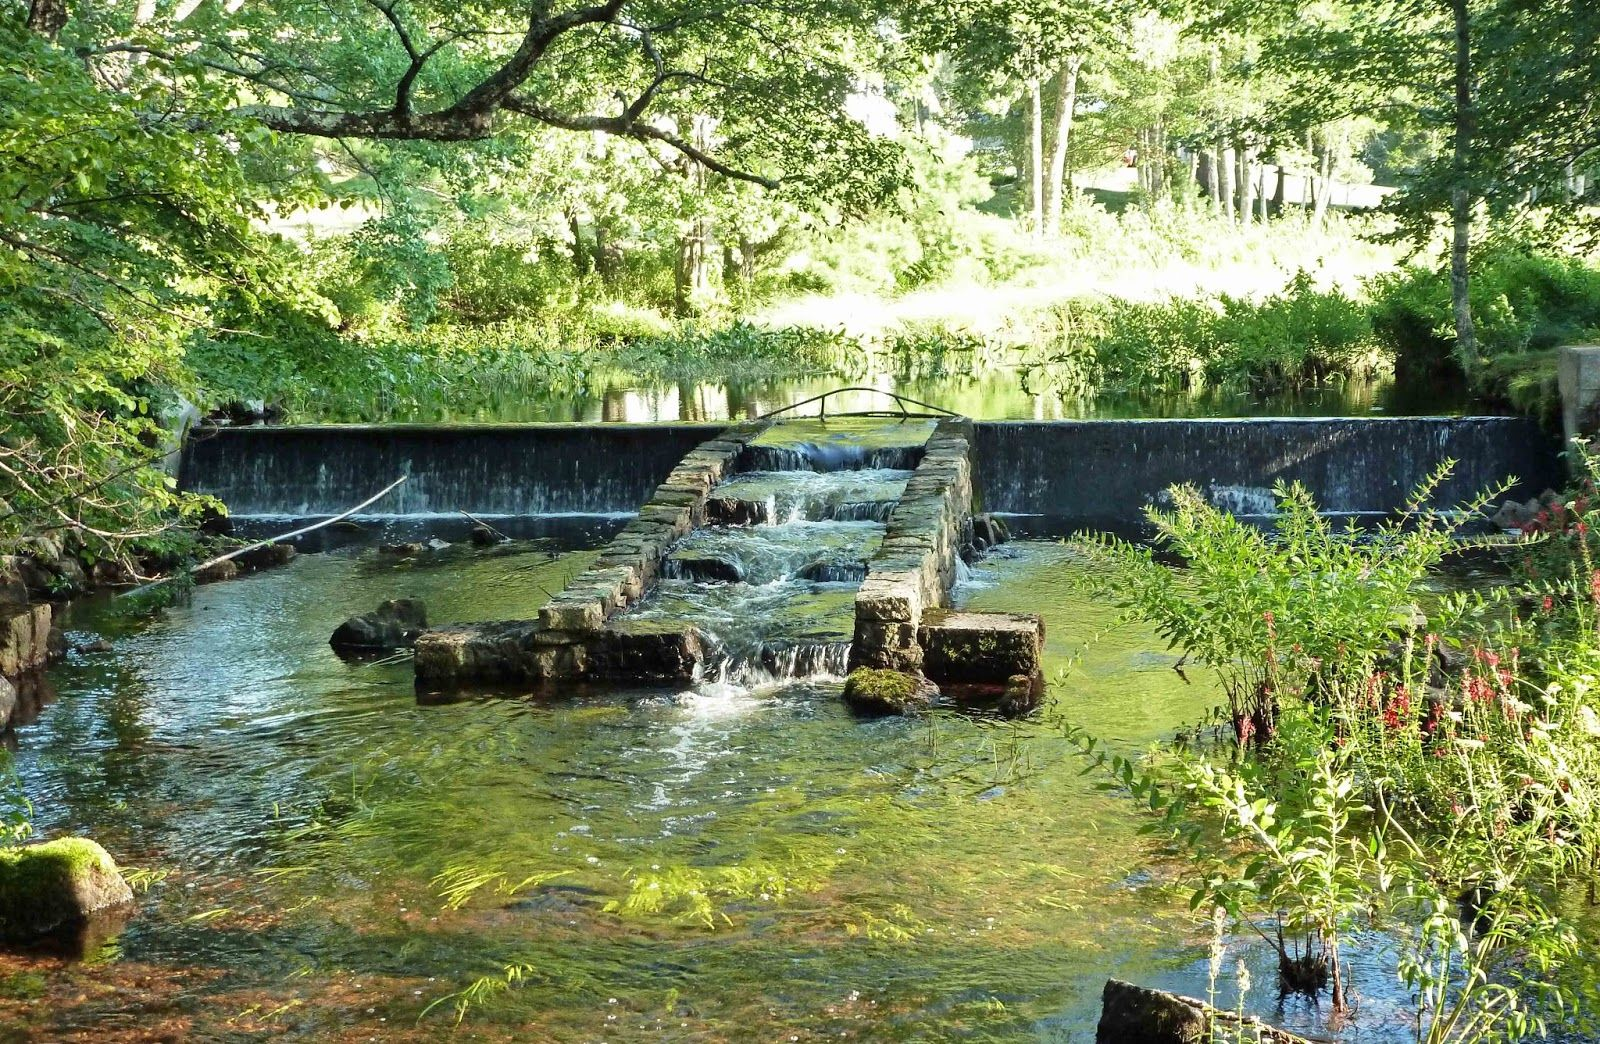 Natural swimming pool with fish displaying 19 images for Koi pond natural swimming pool